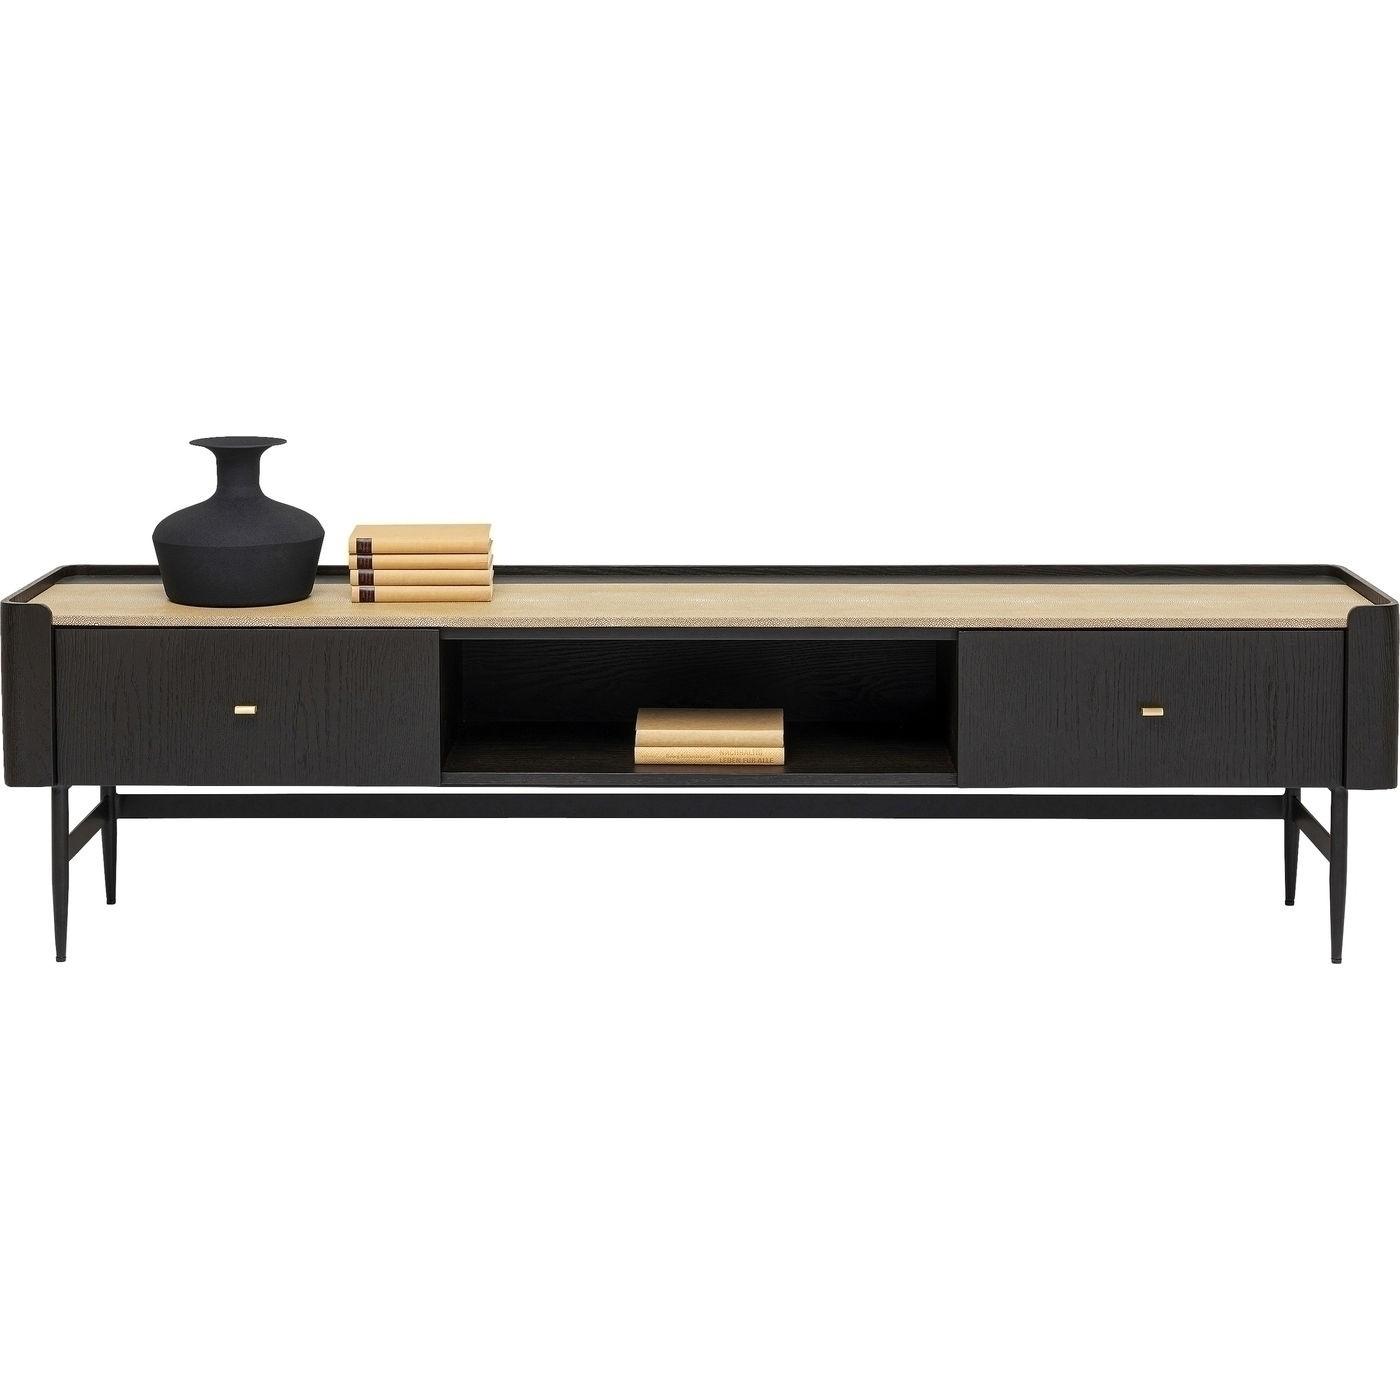 kare design – Kare design rektangulær milano tv-bord, m. 2 skuffer - natur, sort egetræsfiner og stål (200x40) på boboonline.dk